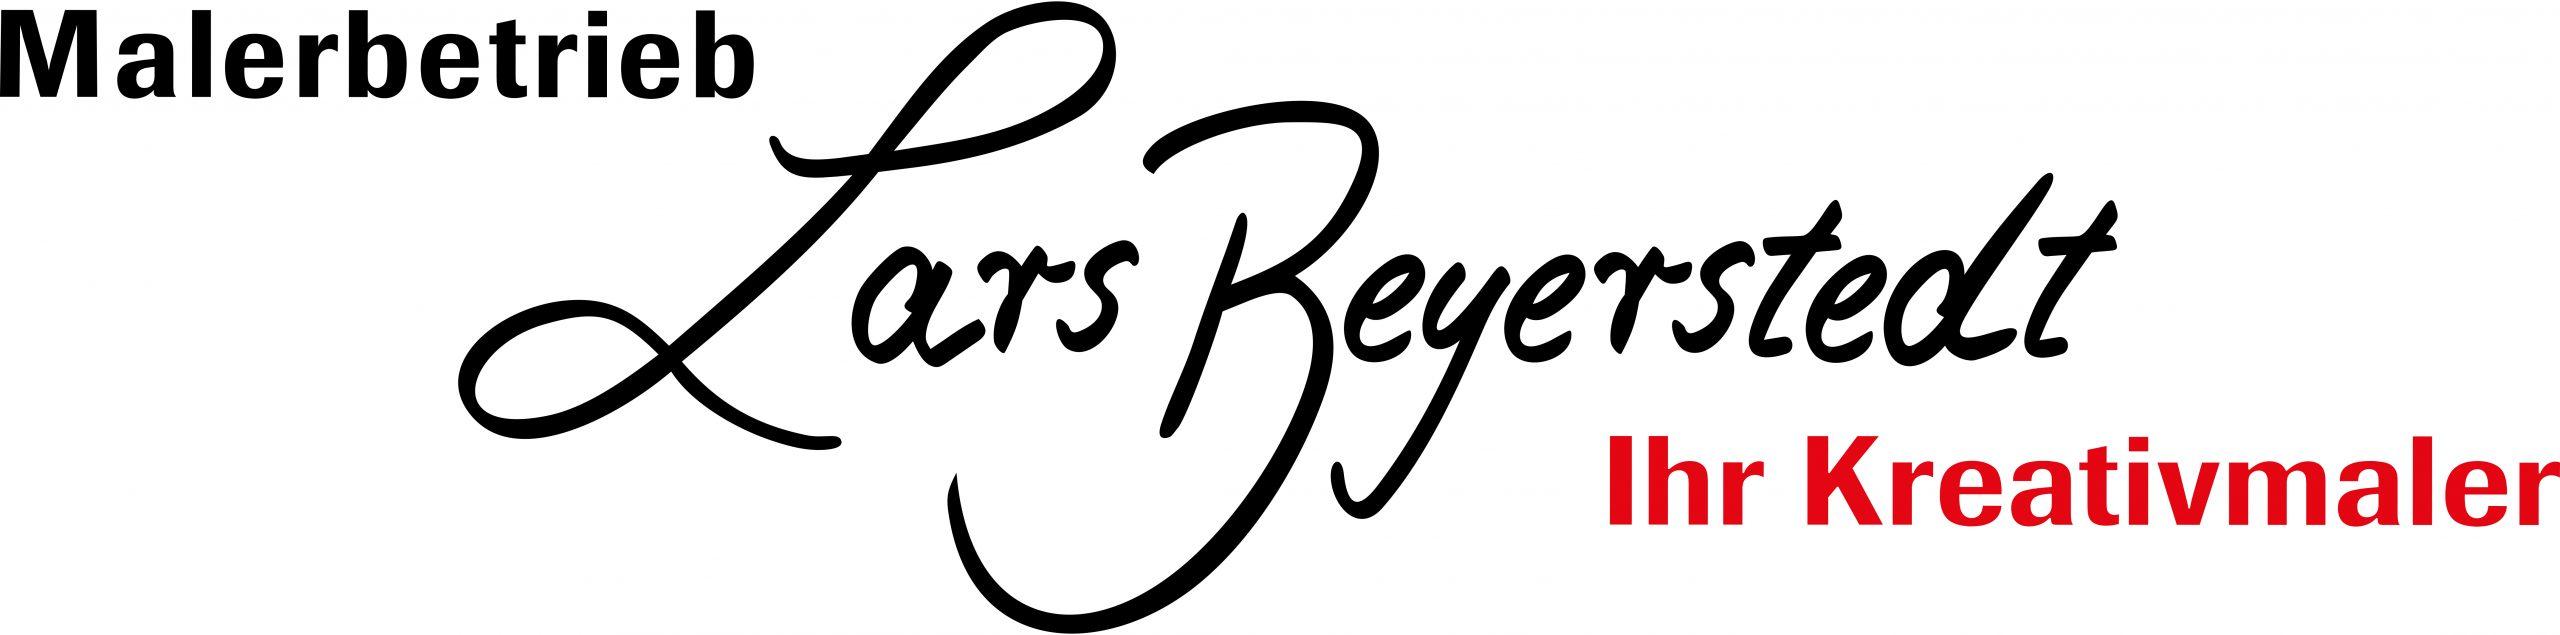 Malerbetrieb Lars Beyerstedt